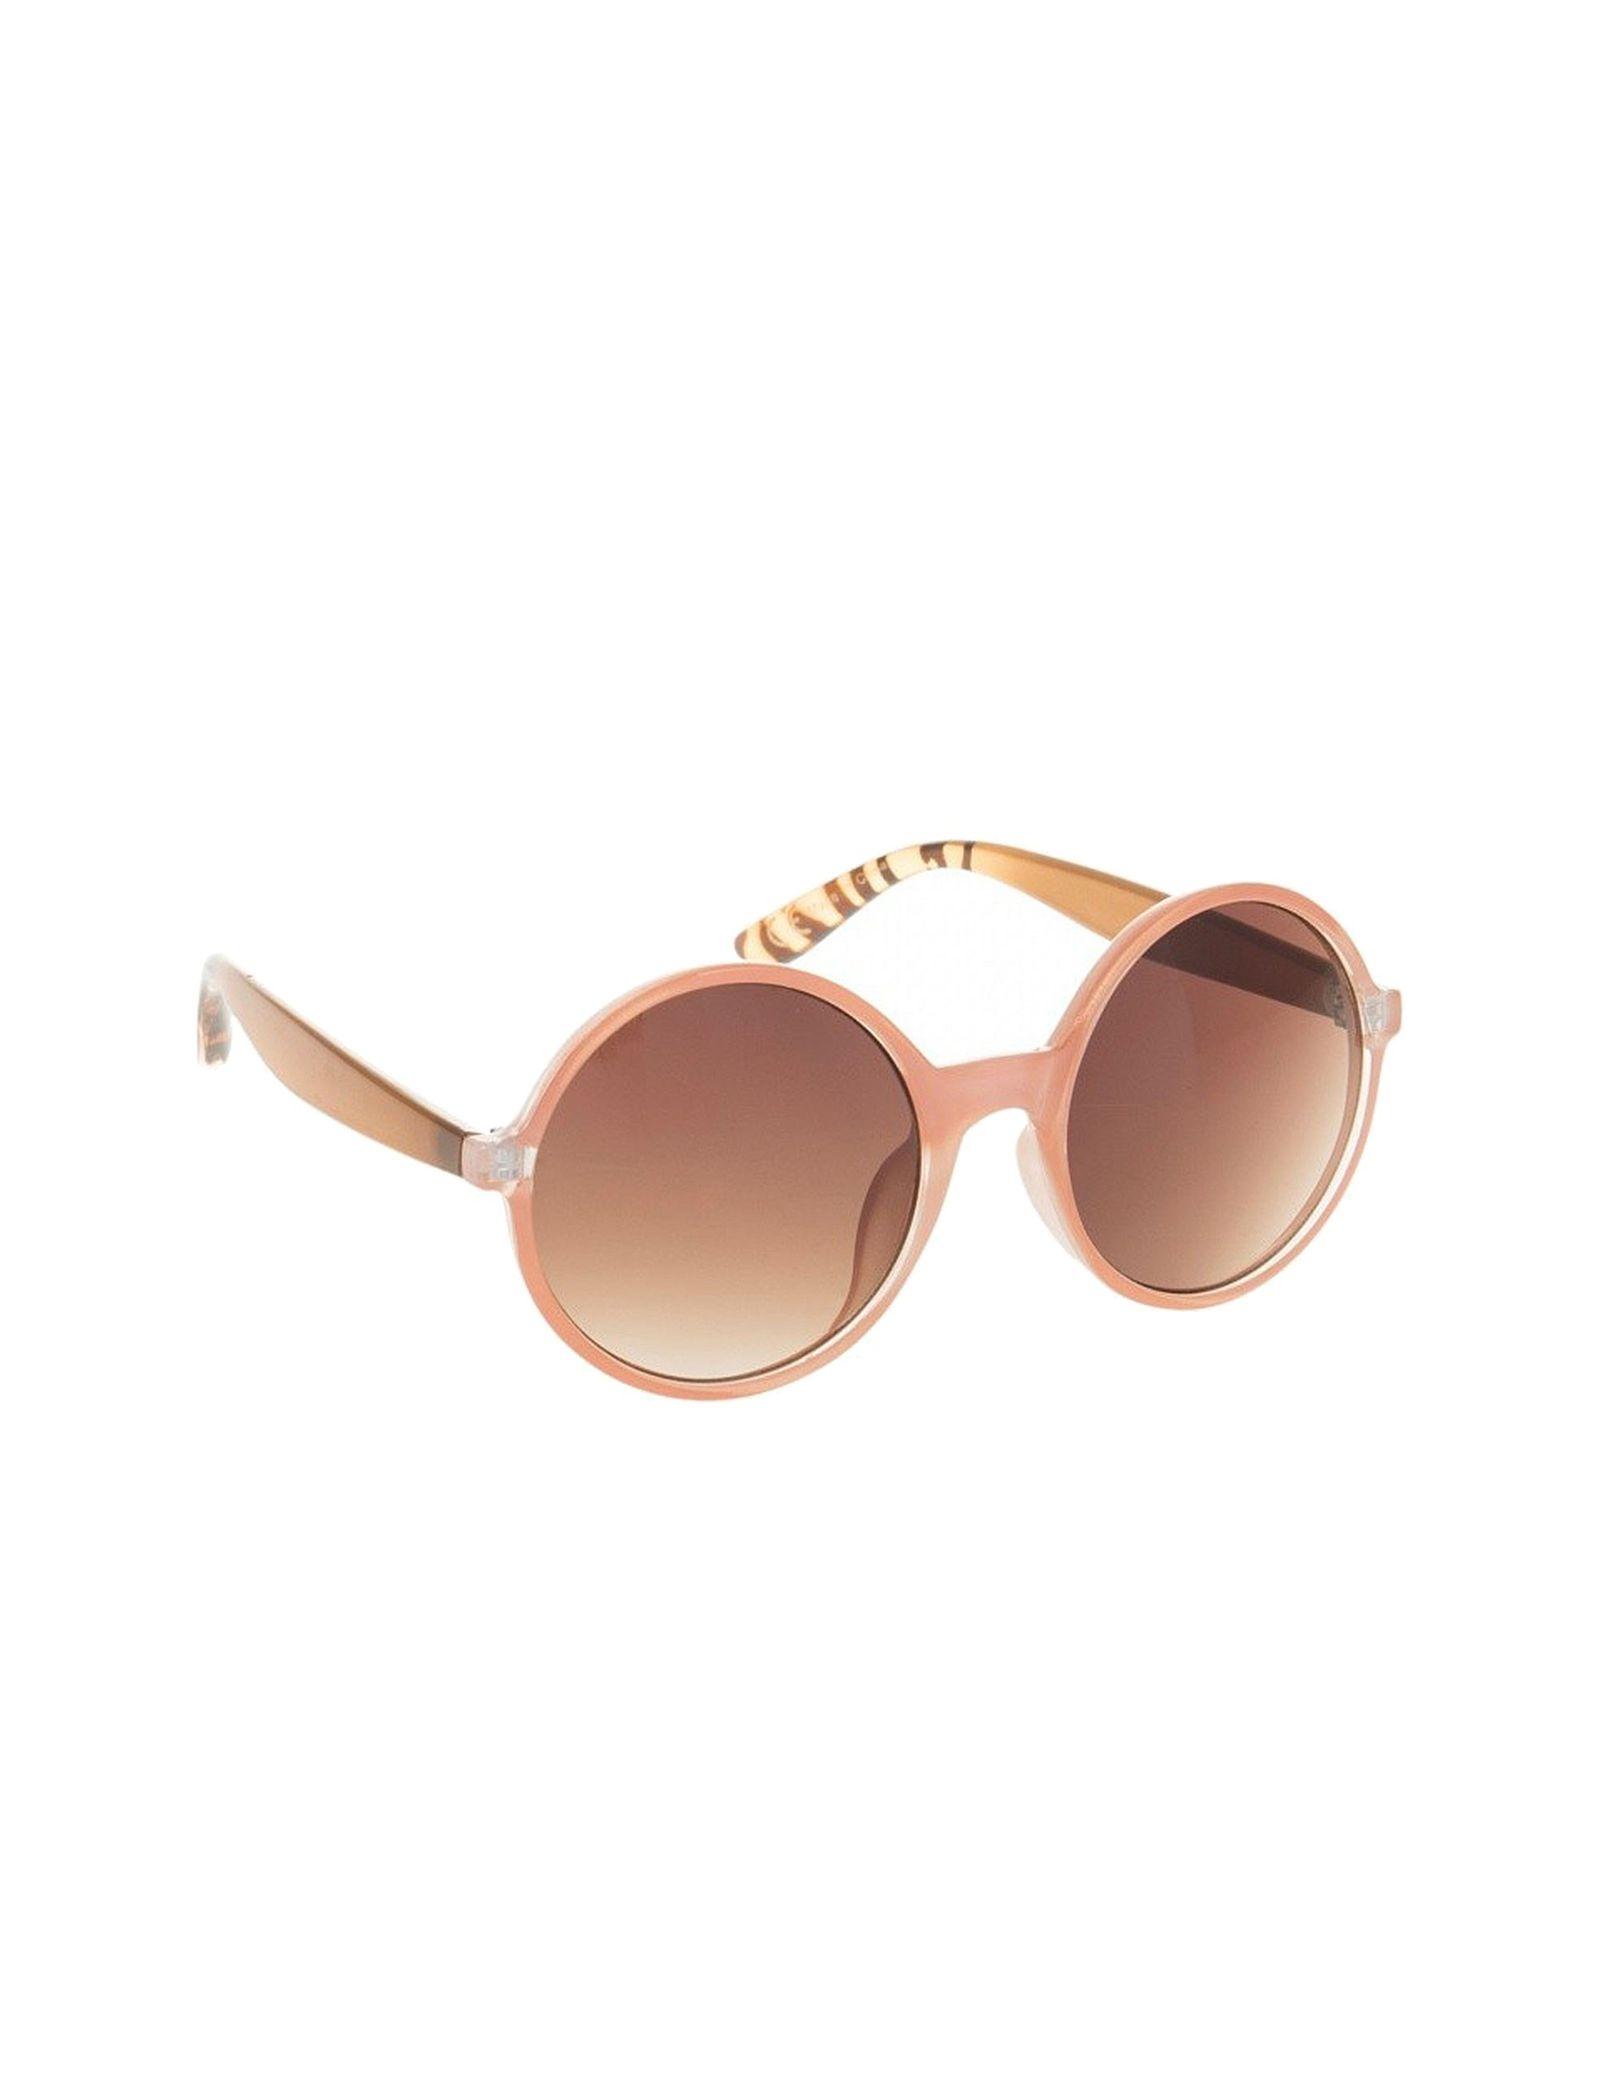 عینک آفتابی زنانه - پارفوا -  - 1